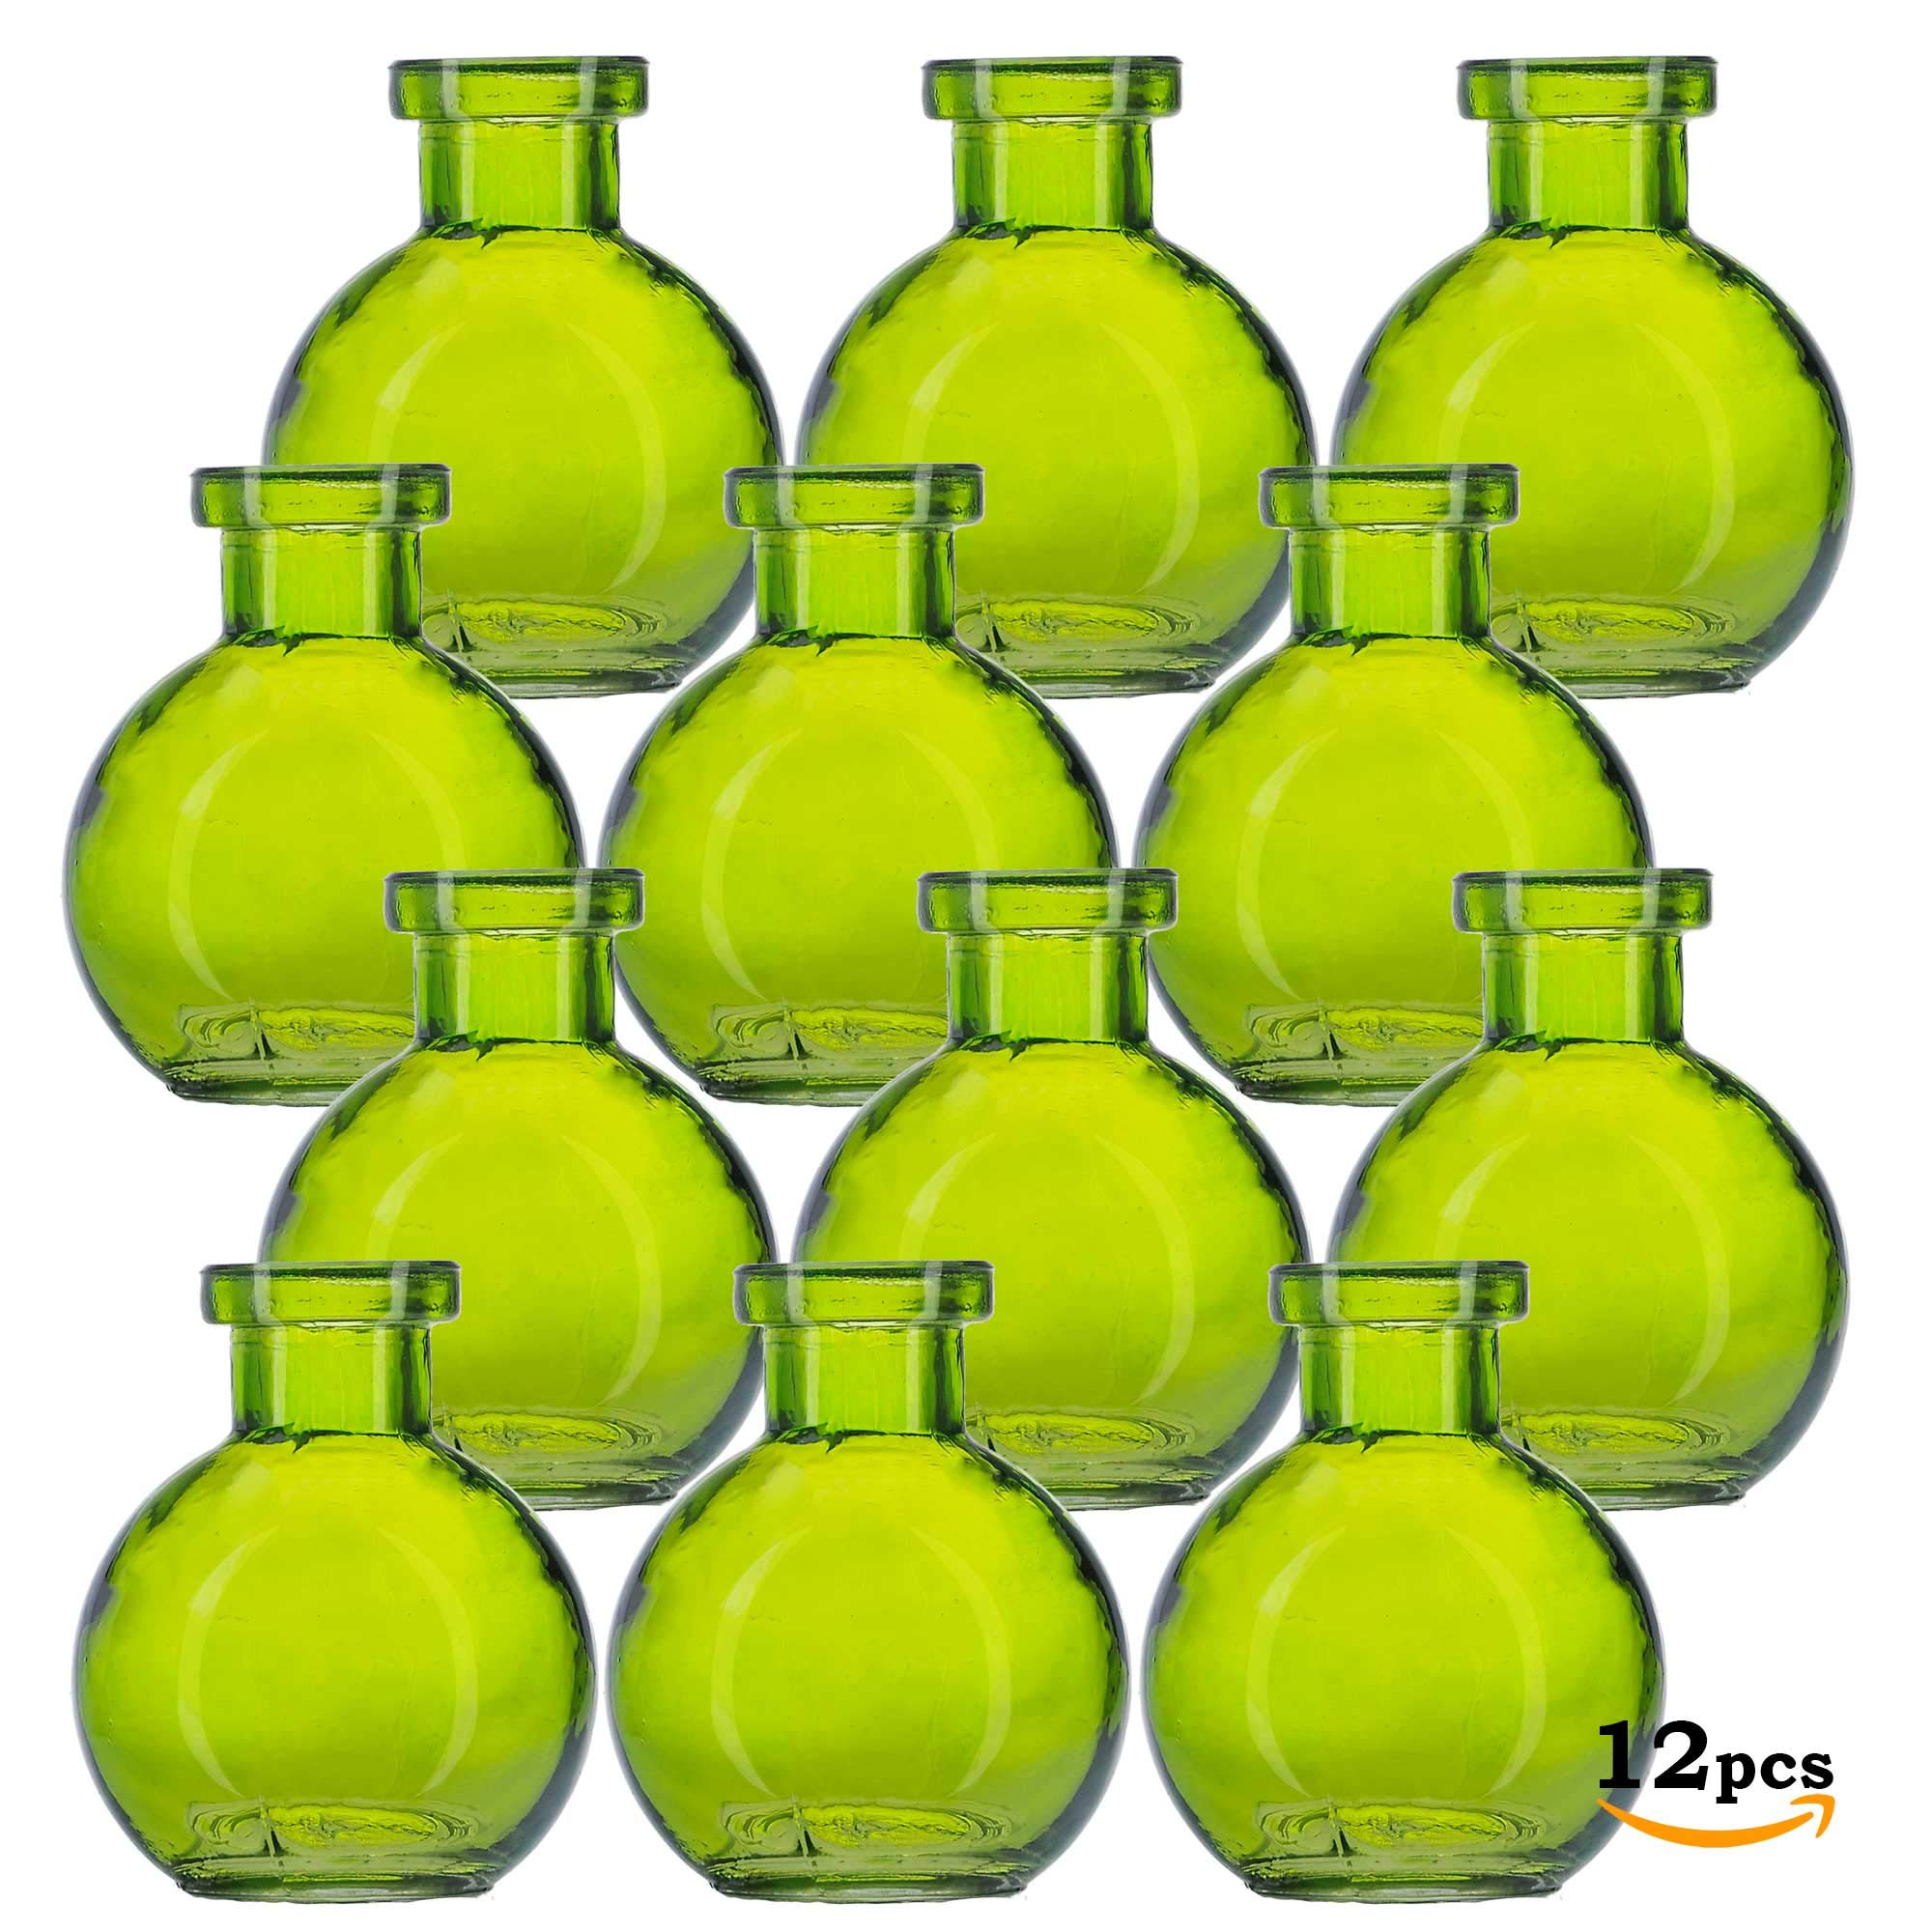 Glassnow C6545G01-N Ball Glass Bottle No Cork, 3.4oz, 12 Pieces, Lime, 100 ml